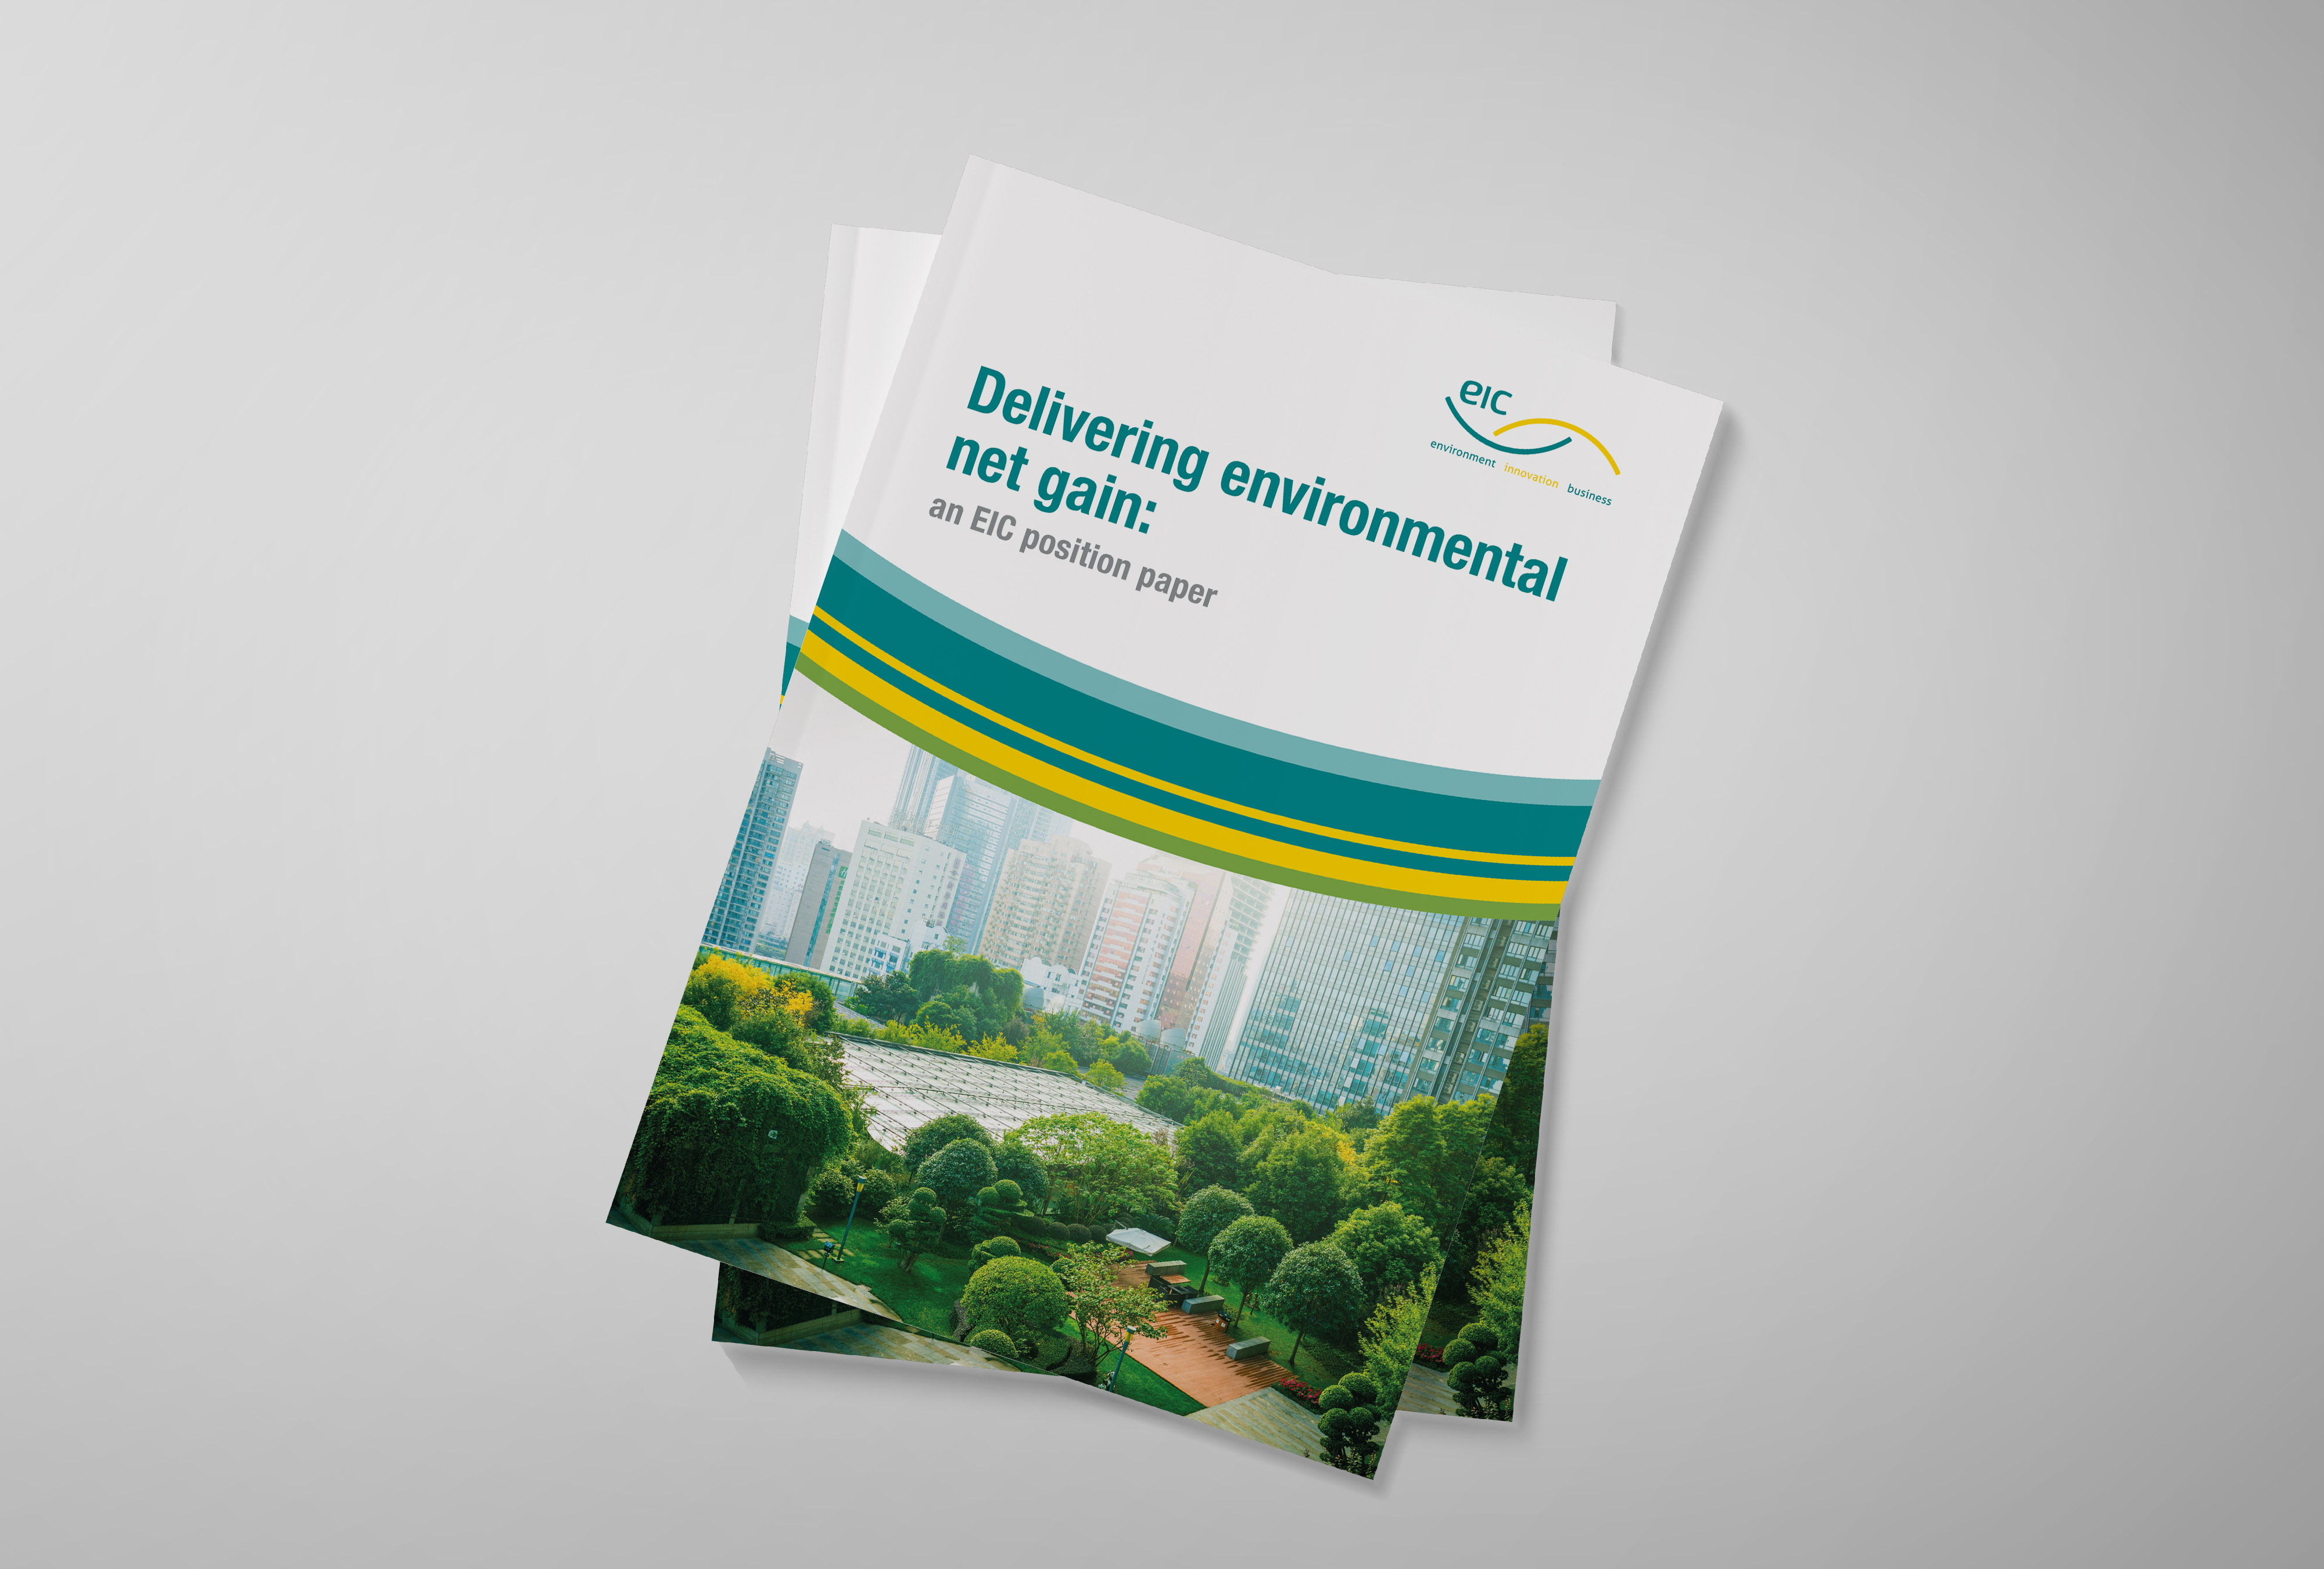 EIC publishes 'Environmental Net Gain' report